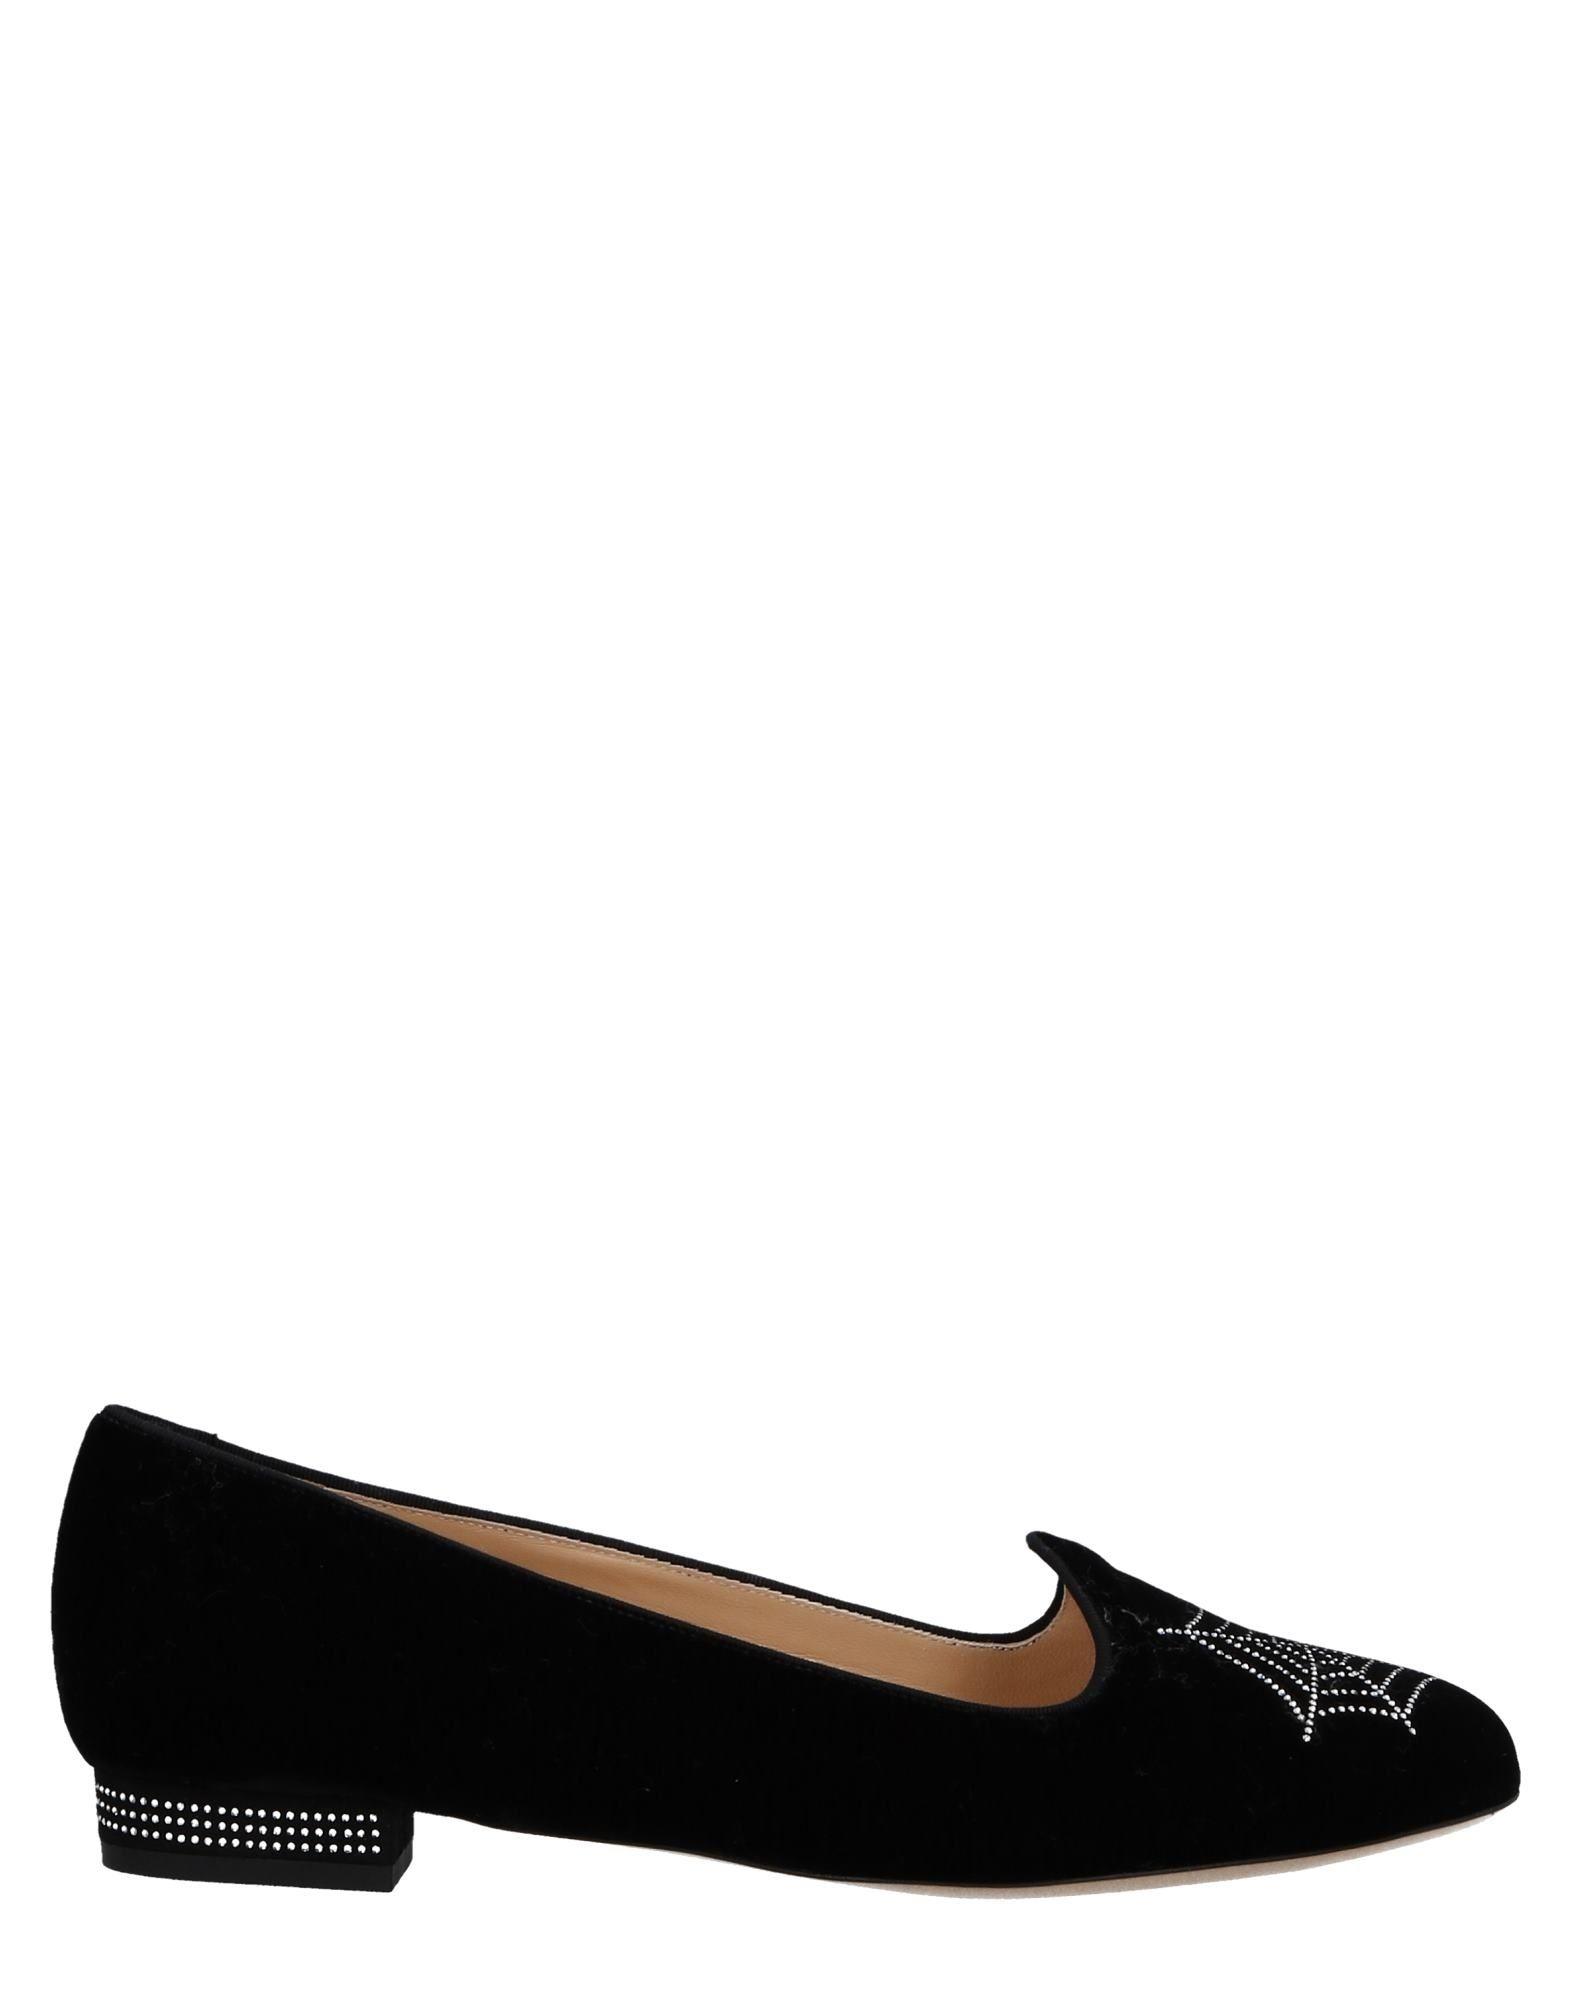 Rabatt Schuhe Charlotte Olympia Mokassins Damen  11510128WV